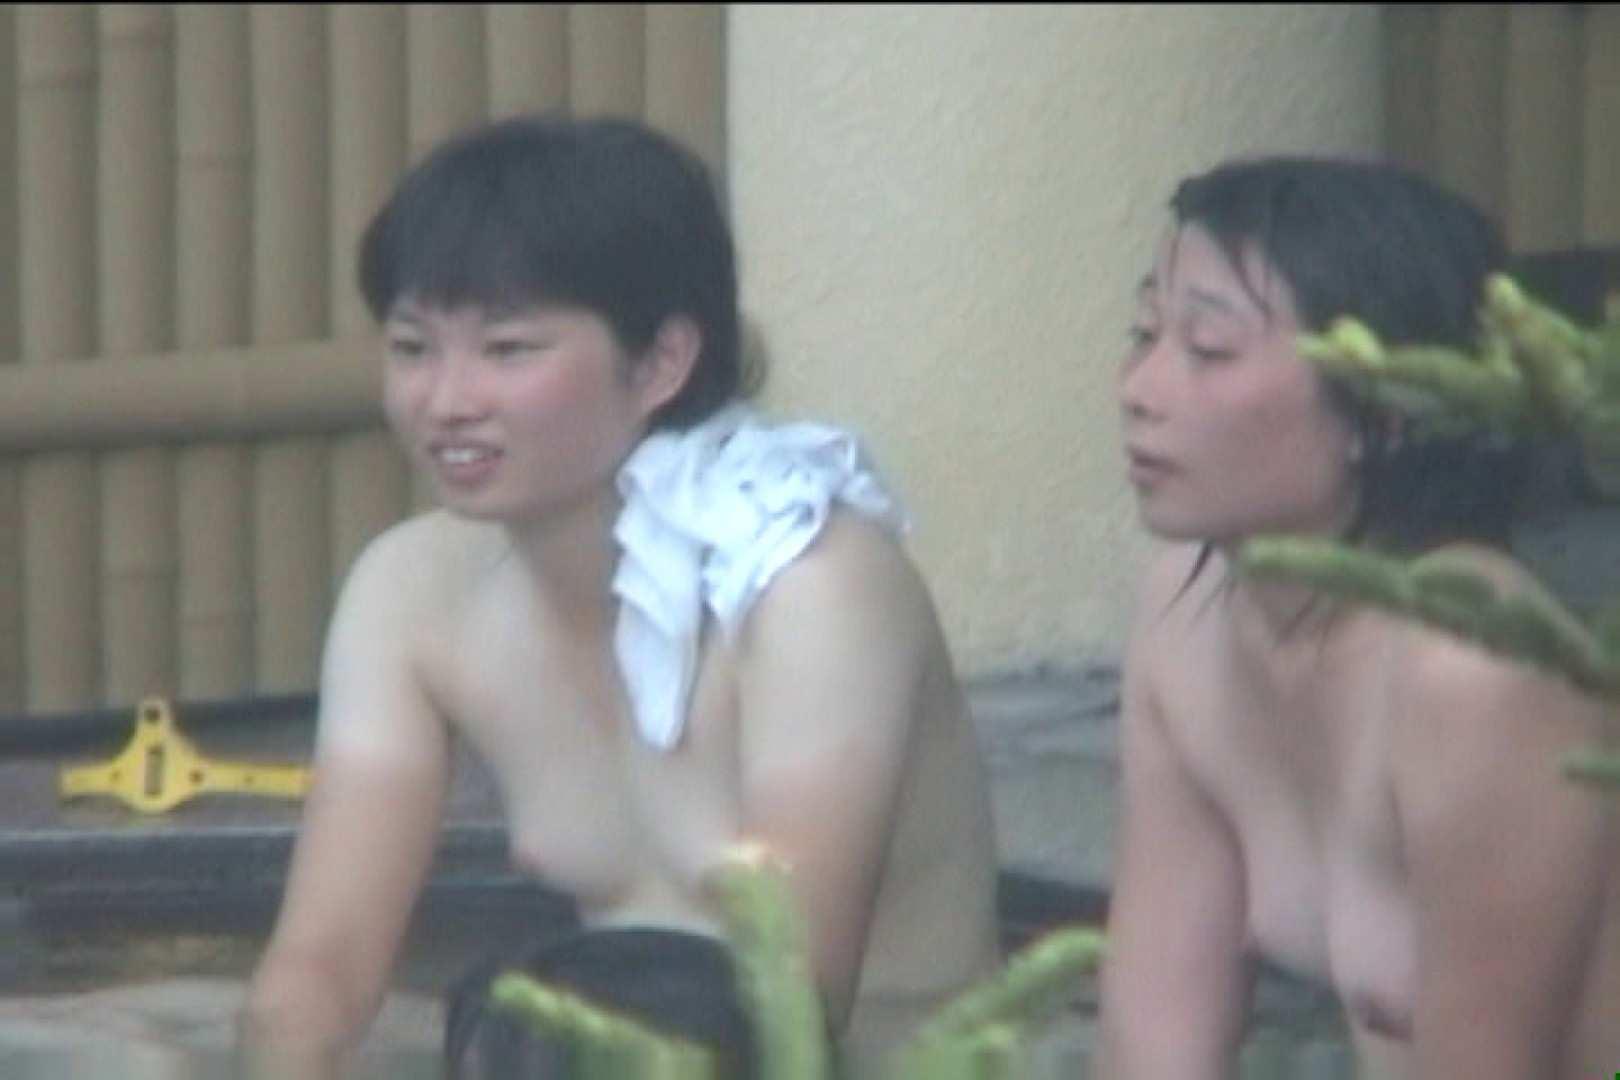 Aquaな露天風呂Vol.99【VIP限定】 露天風呂編 | 盗撮シリーズ  108PIX 13